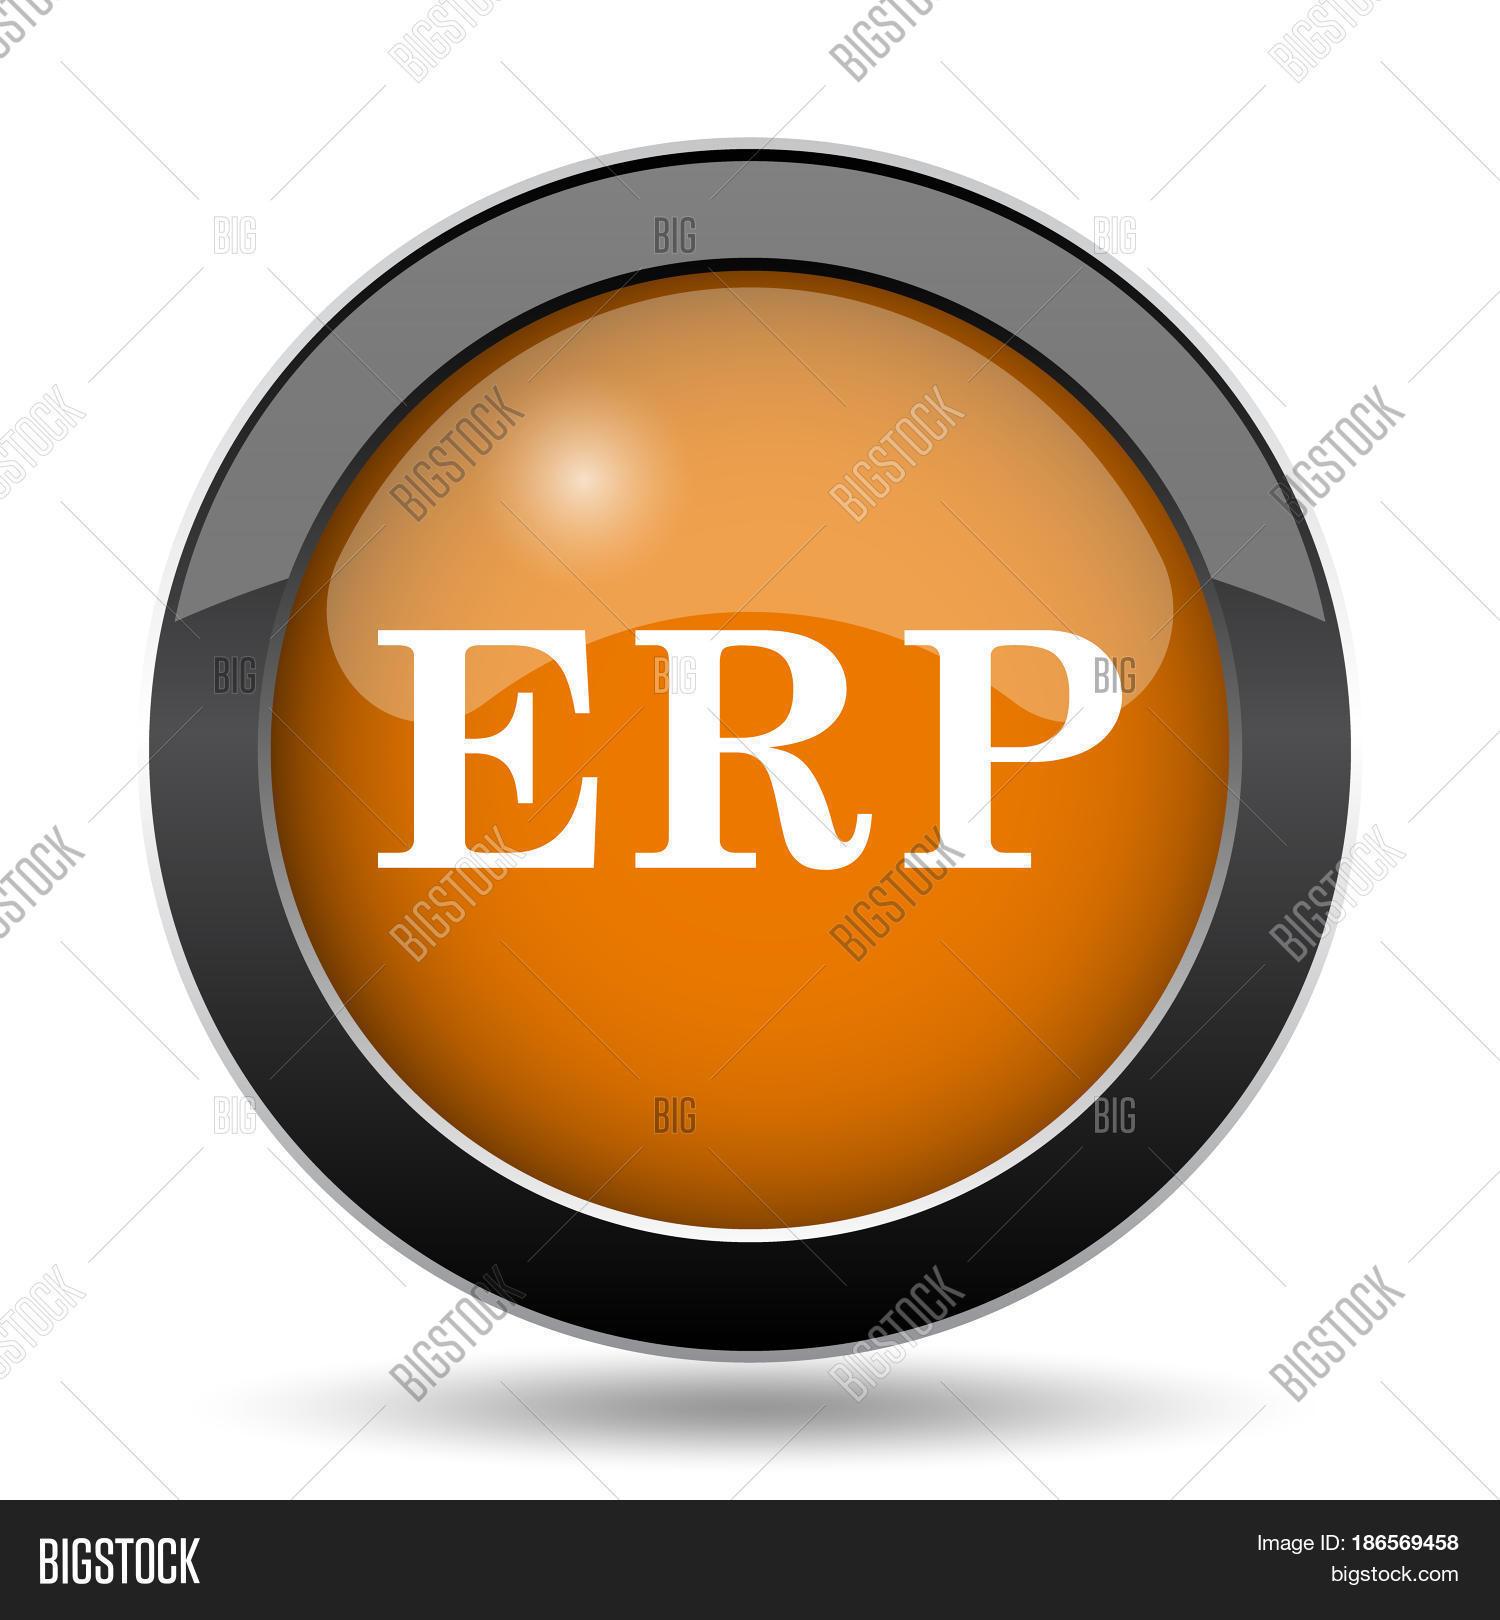 erp icon image photo free trial bigstock